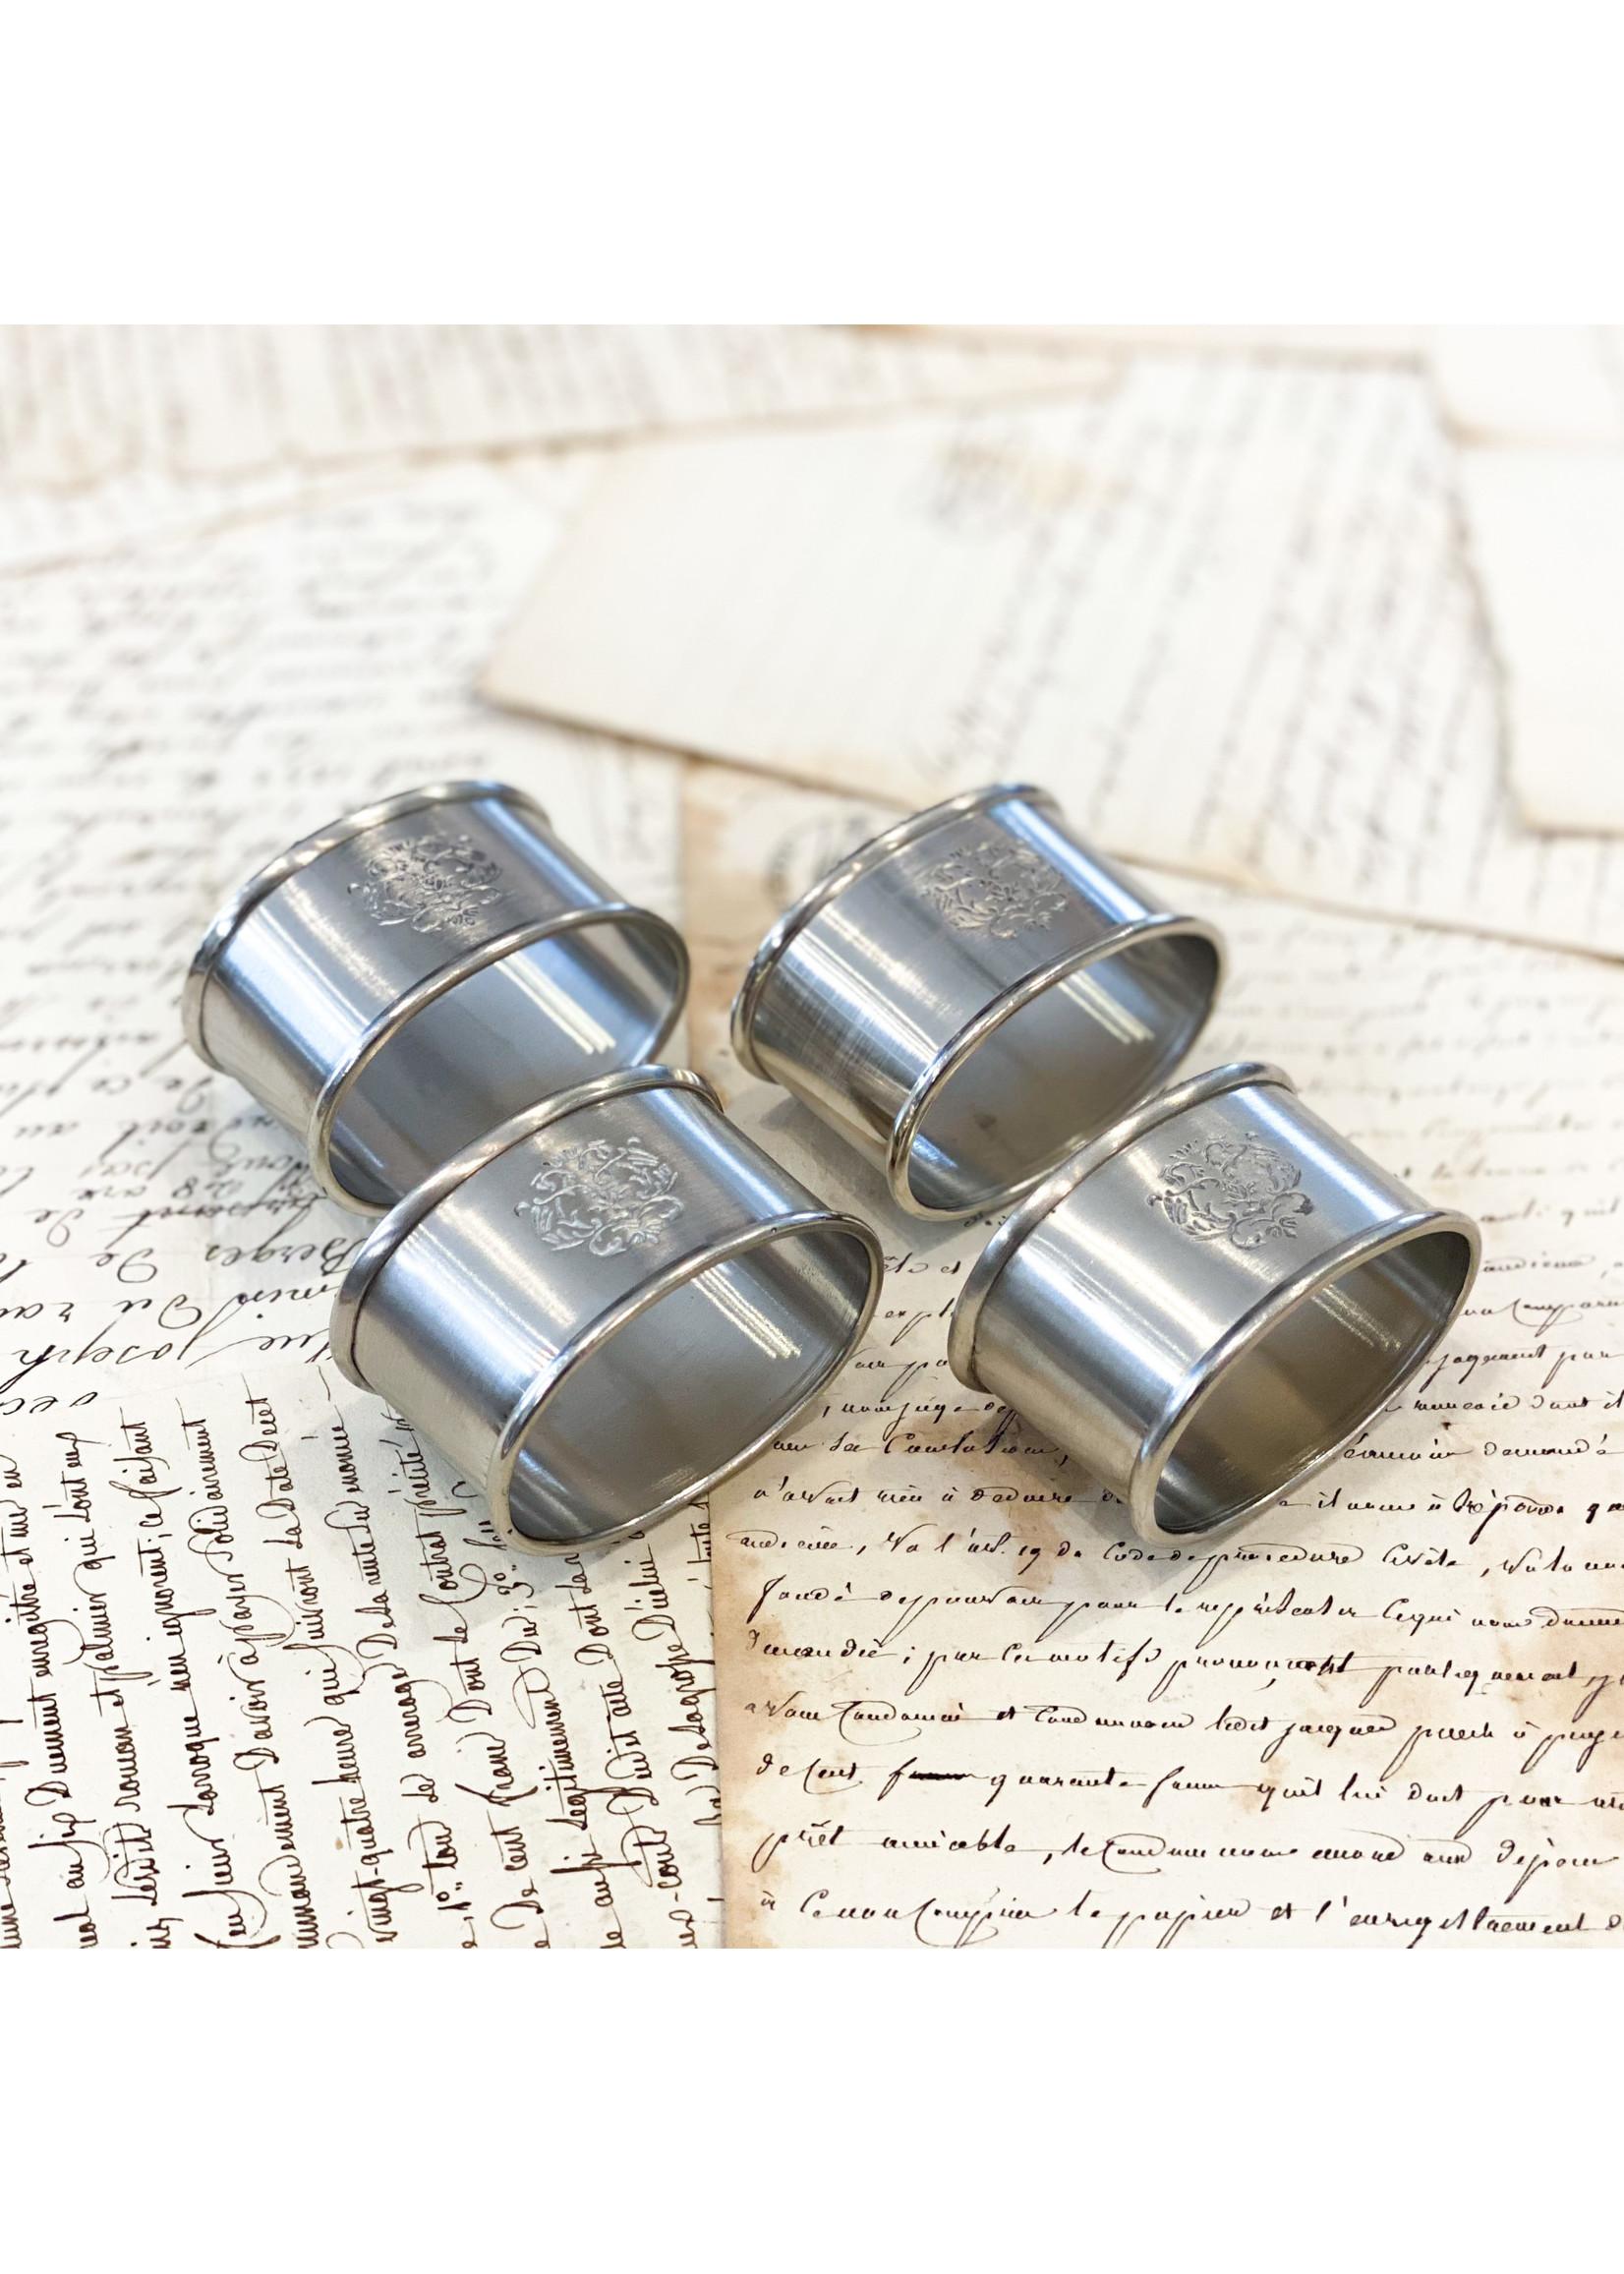 Crown Linen Napkin Ring Set - Damask (set of 4)